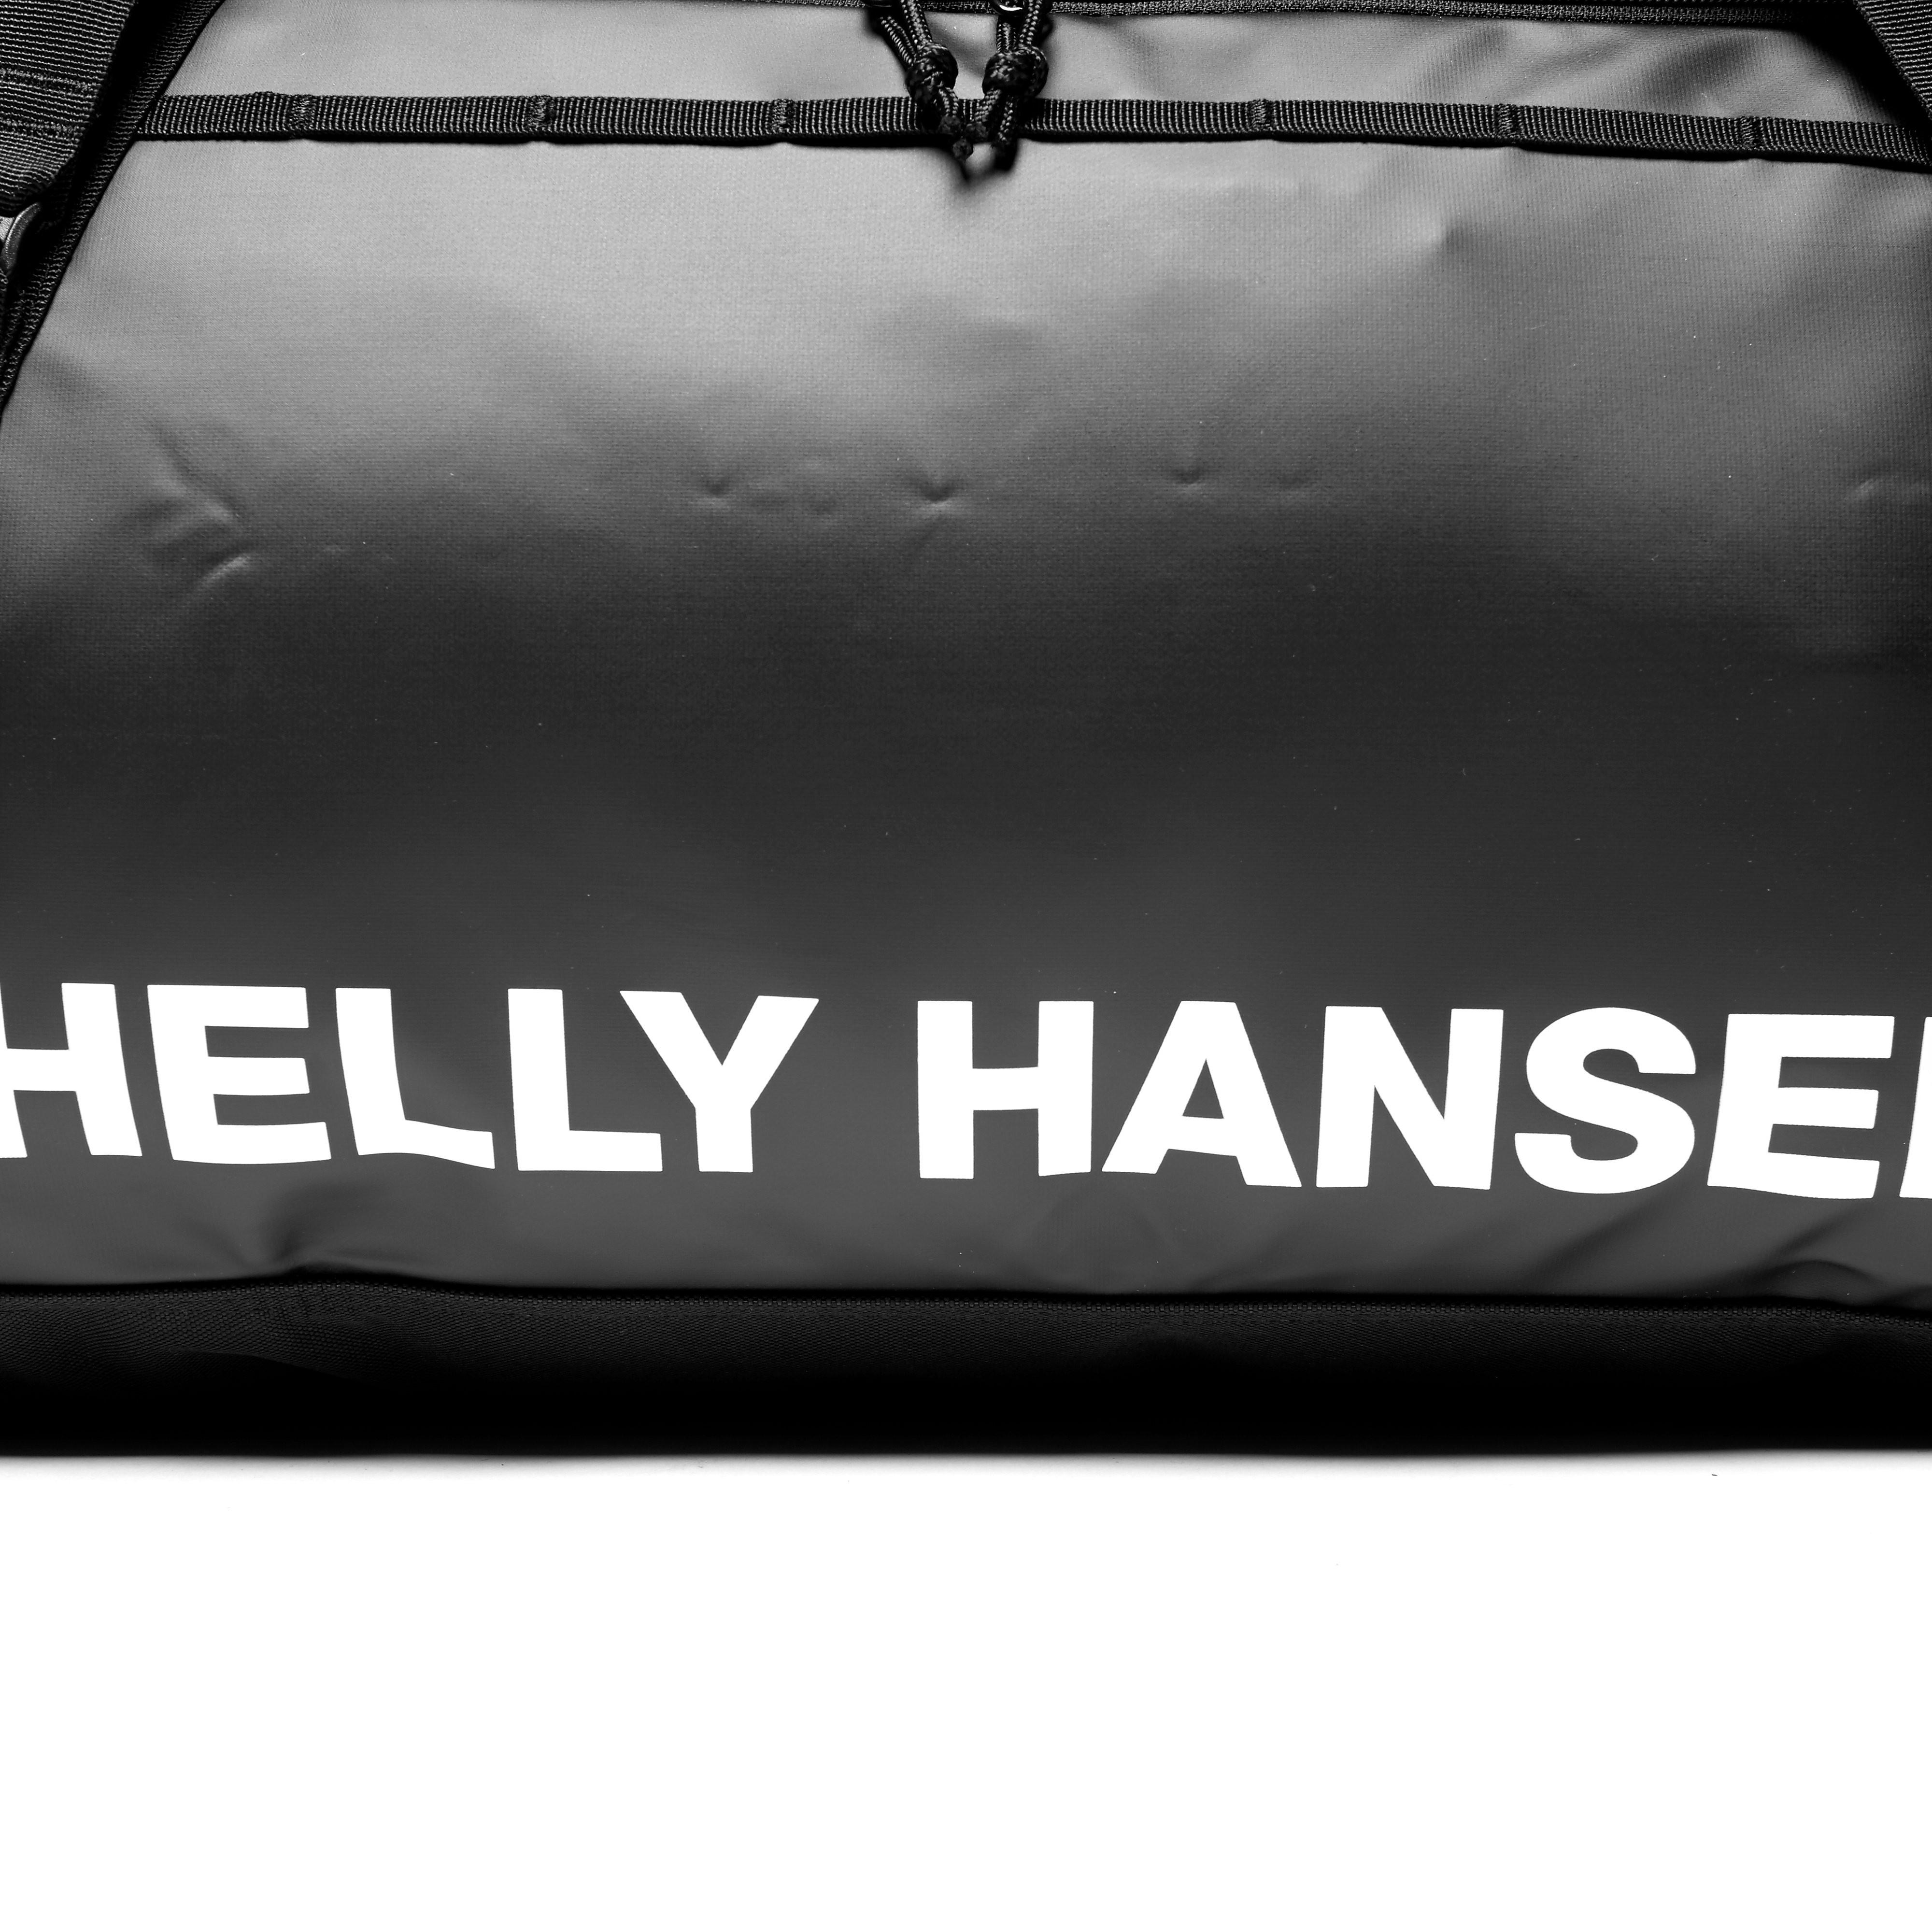 Helly Hansen Duffle Bag 2 70L